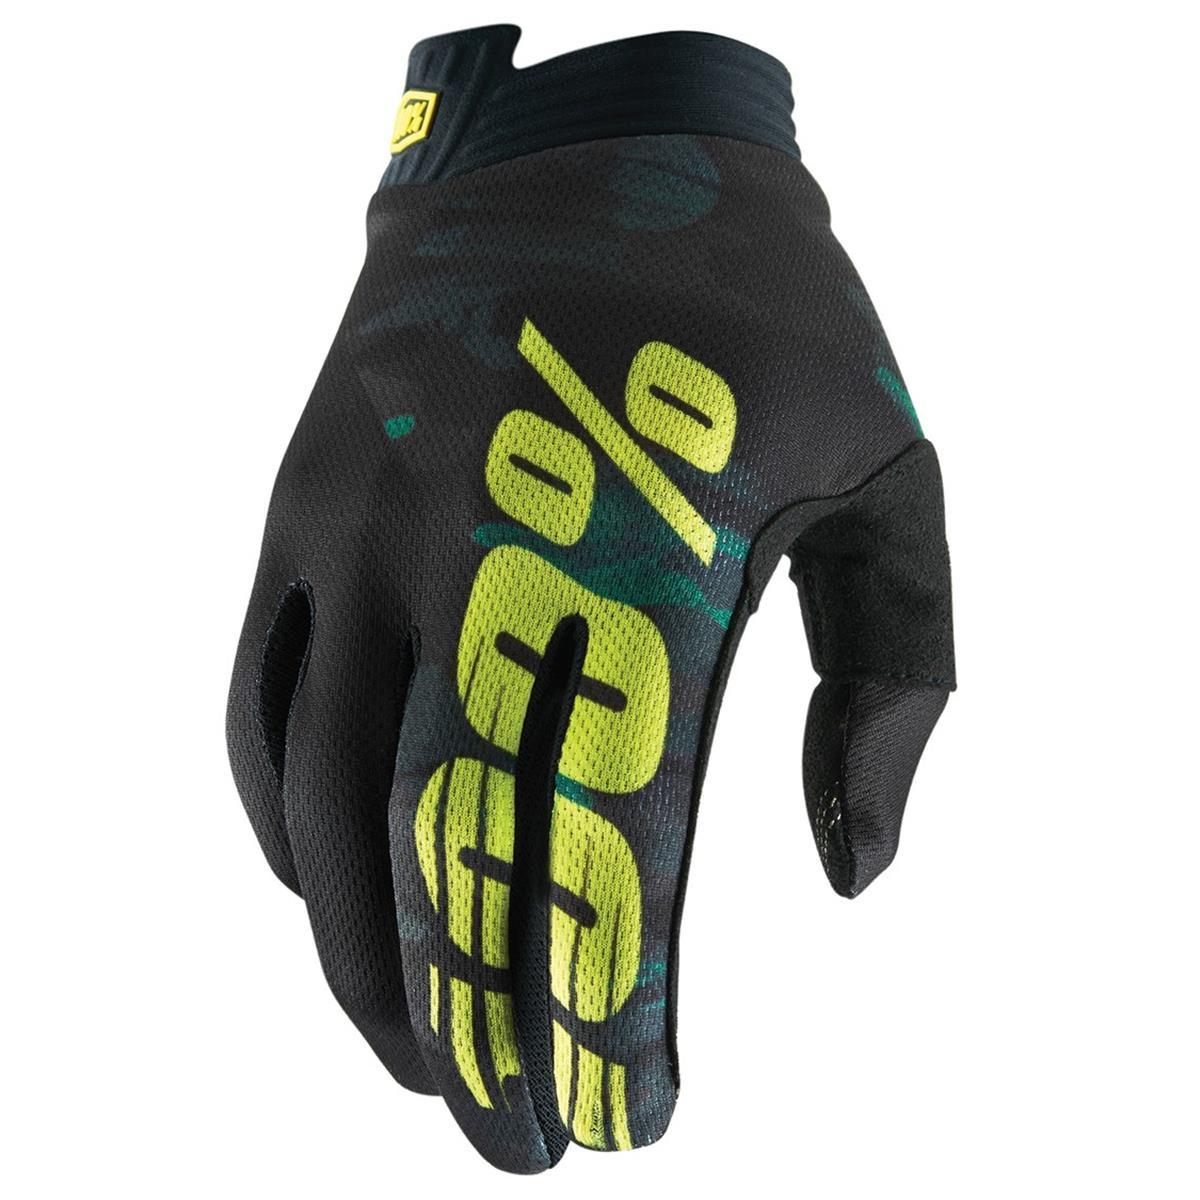 100% Bike-Handschuhe iTrack Camo Schwarz/Grün